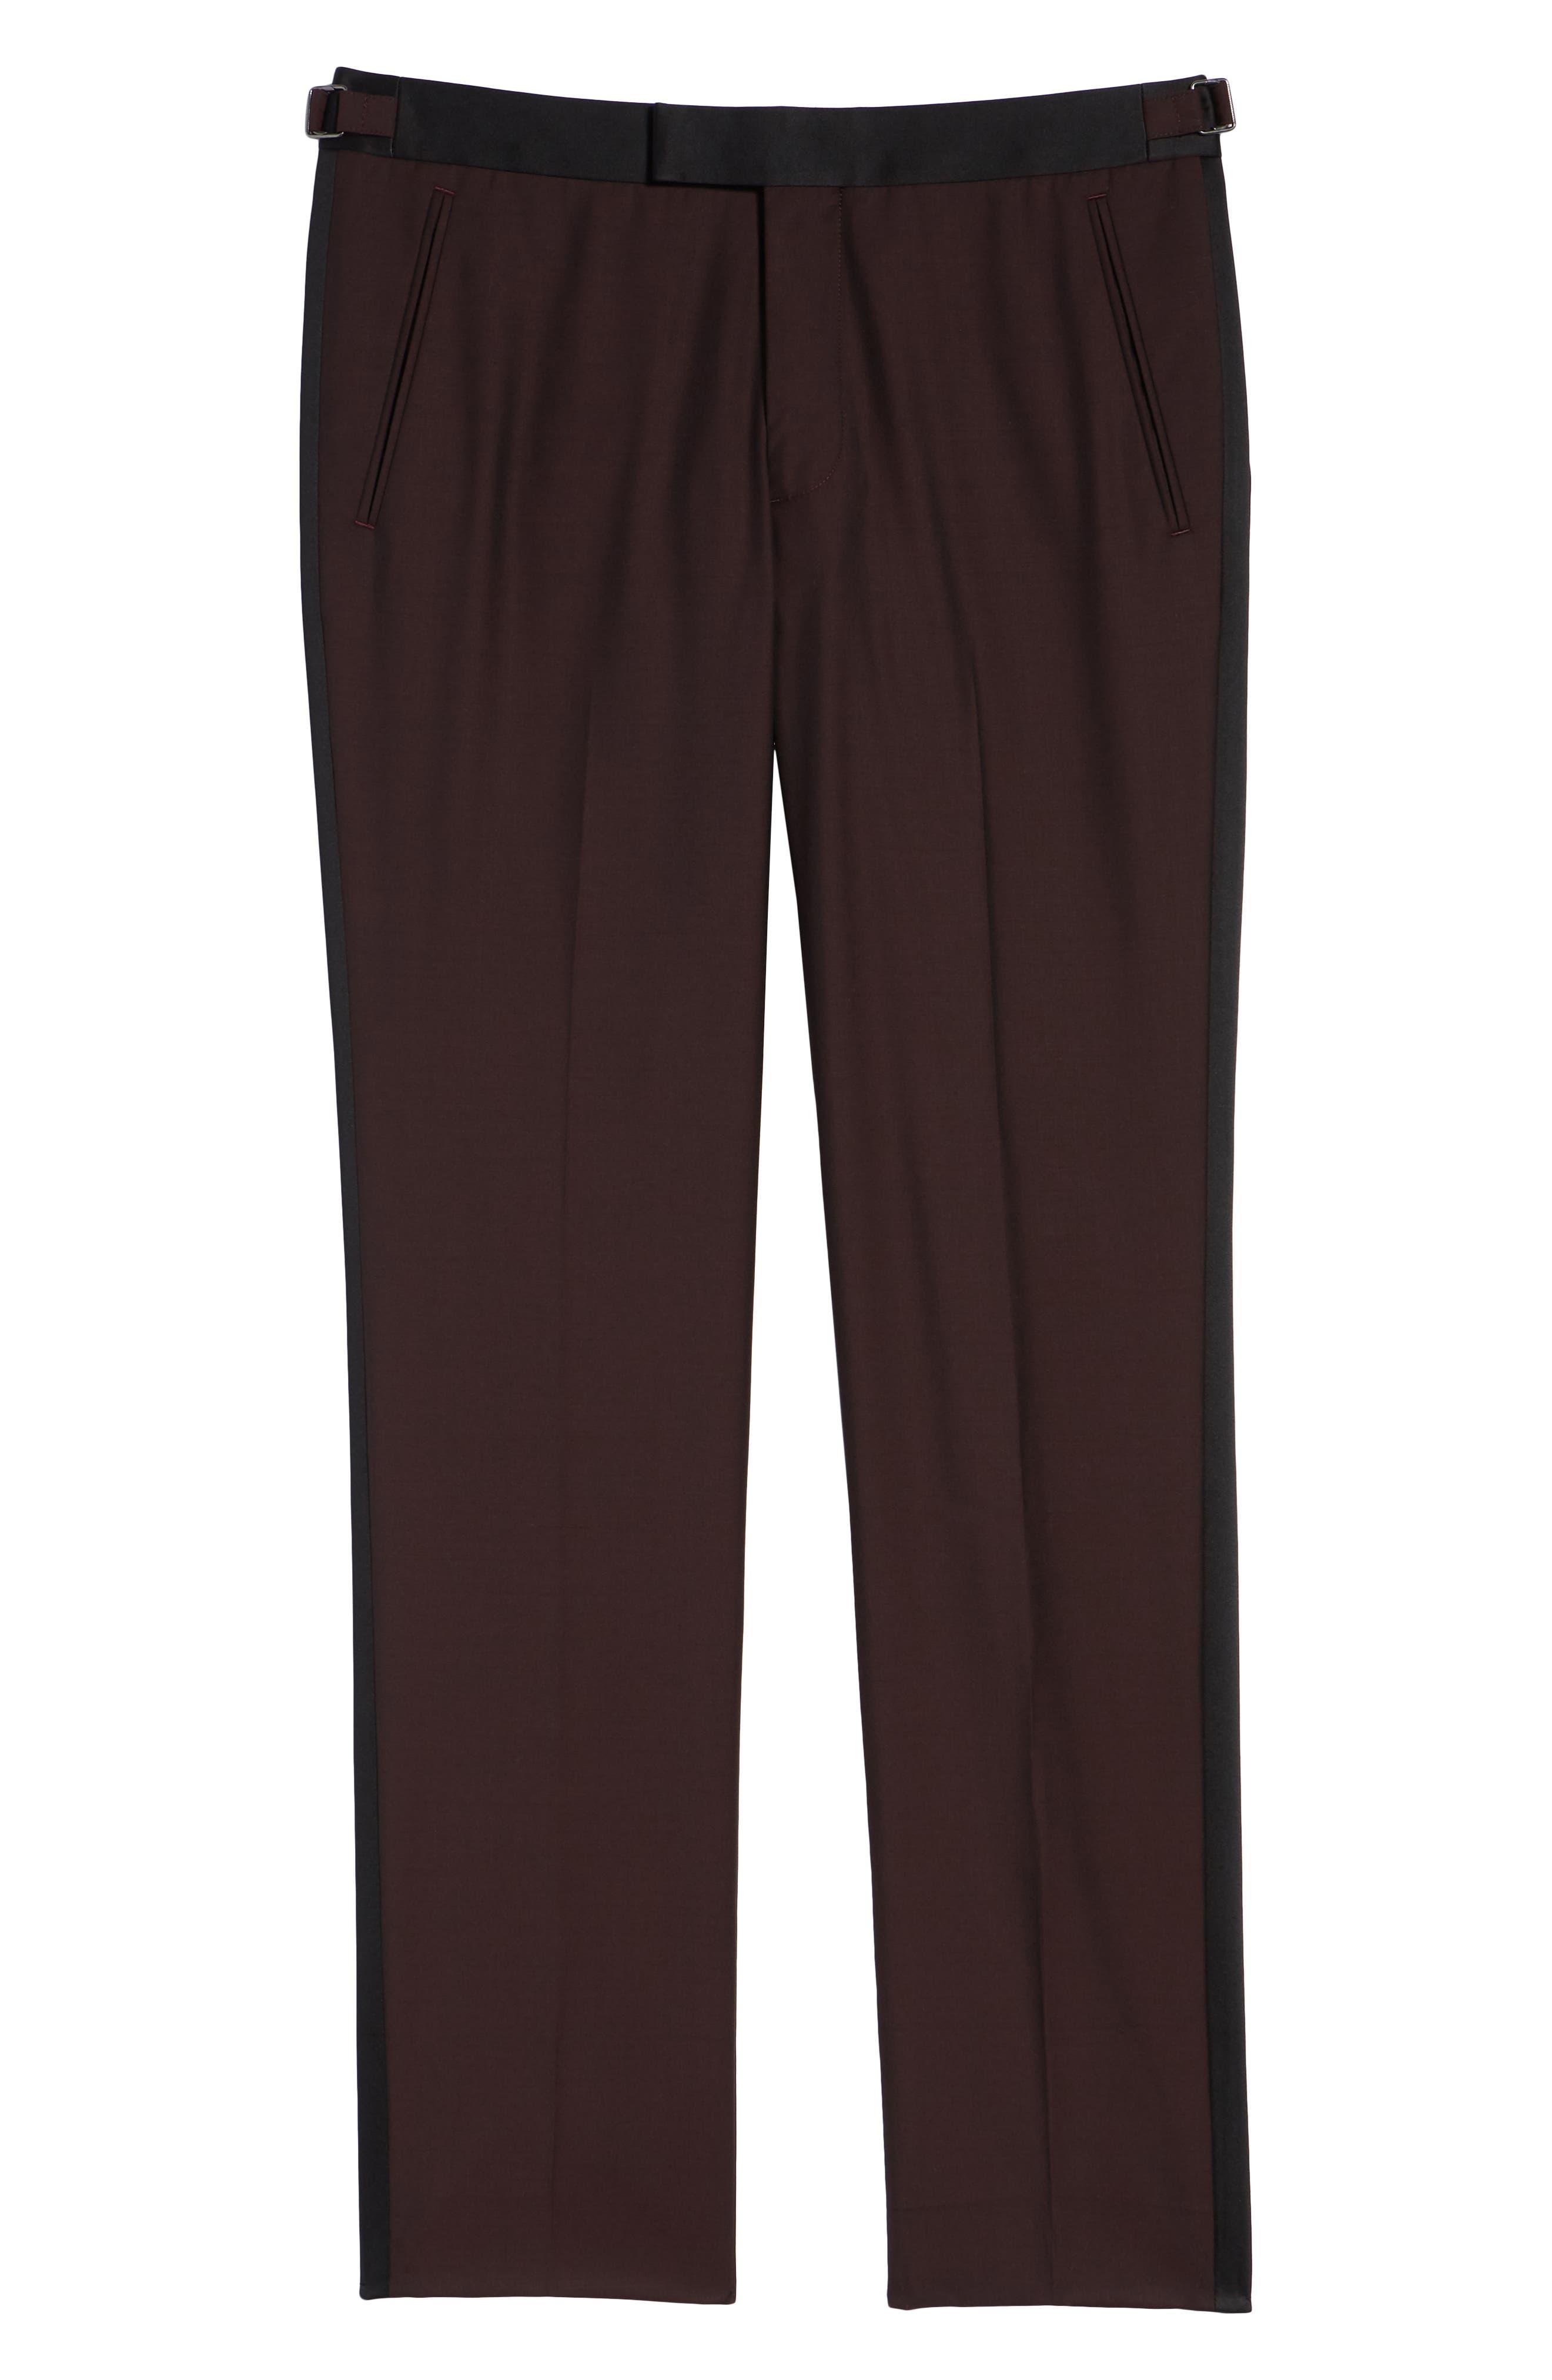 Capstone Slim Fit Tuxedo Trousers,                             Alternate thumbnail 6, color,                             MAROON